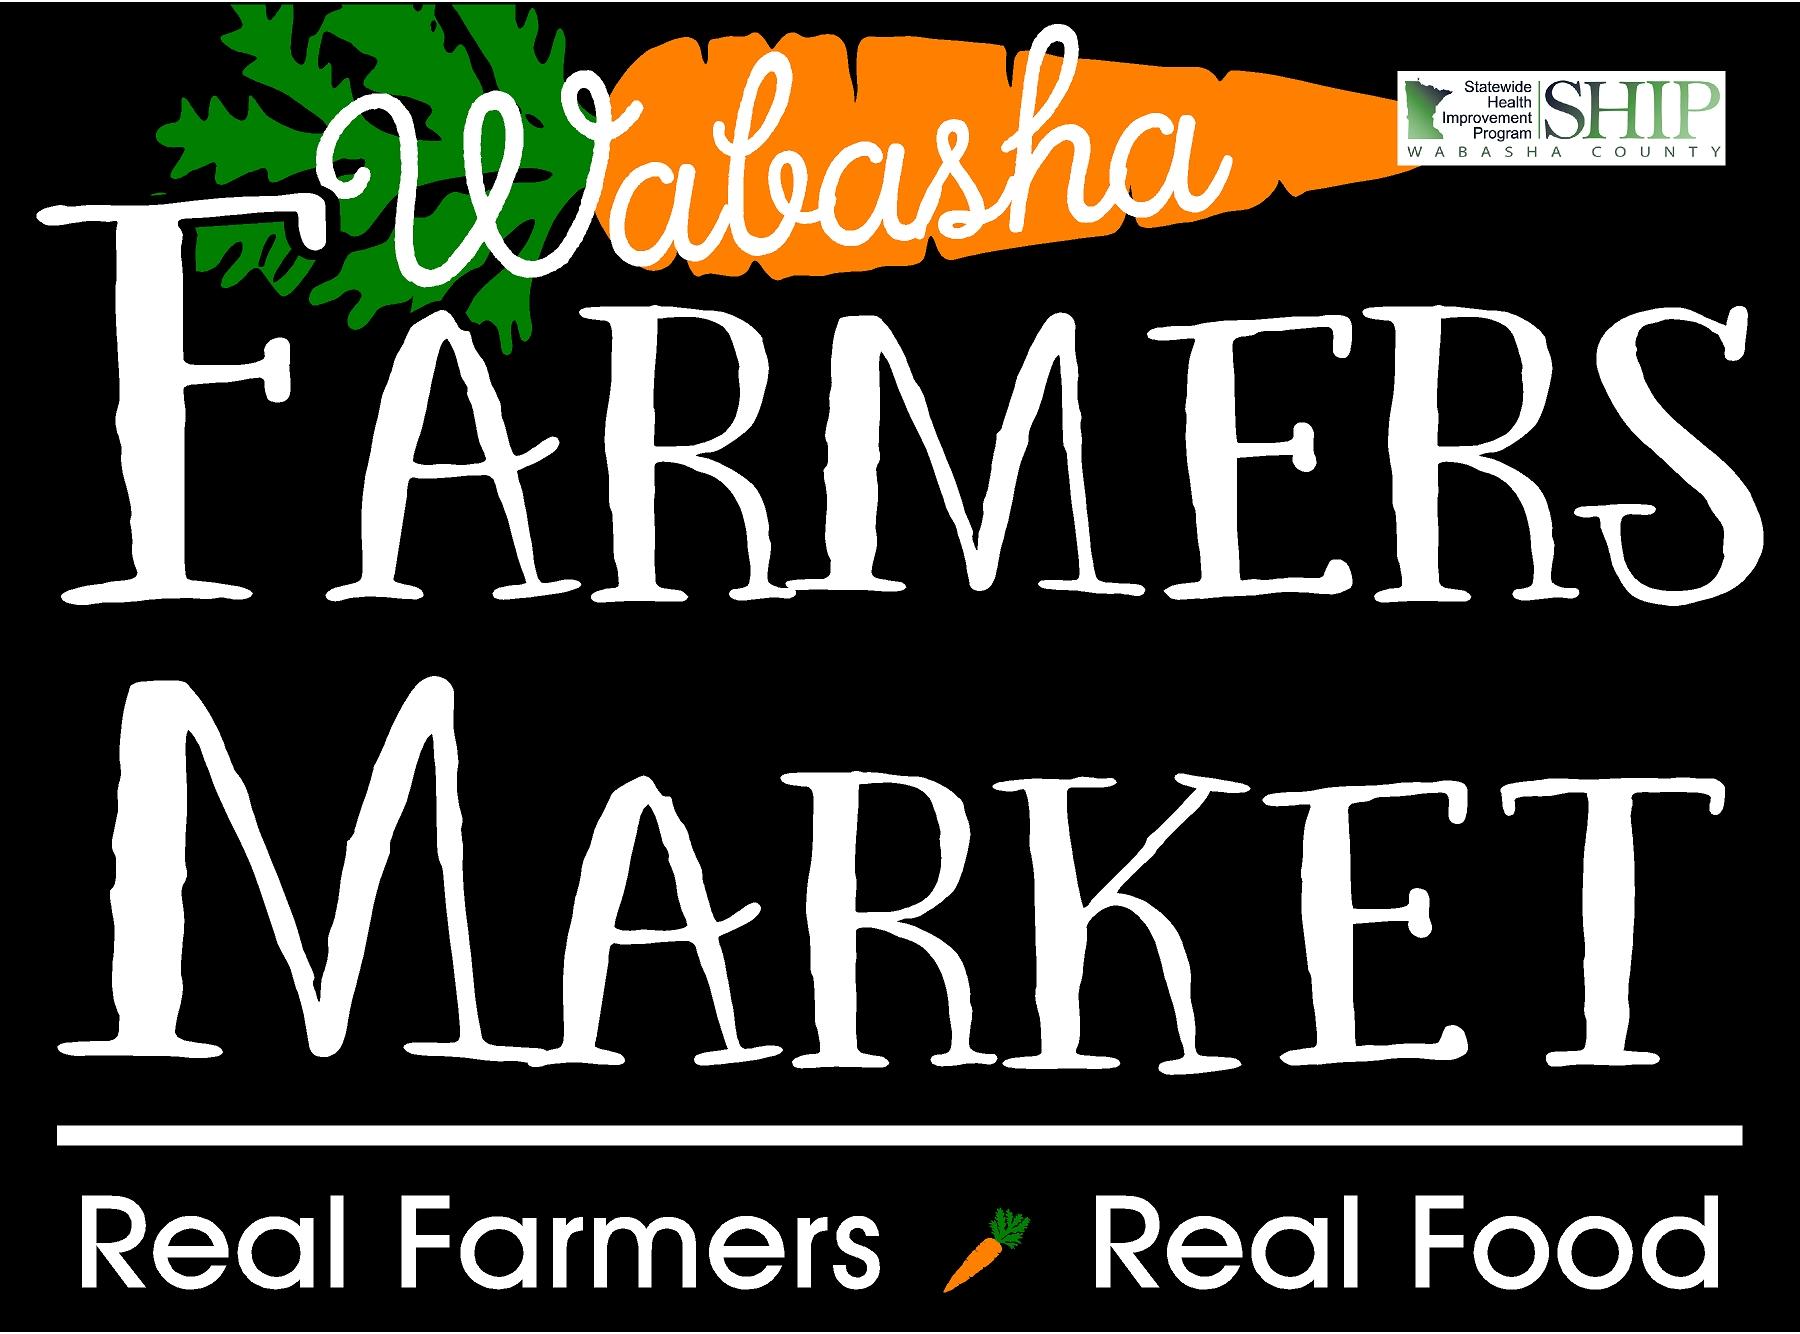 Wabasha farmers market logo